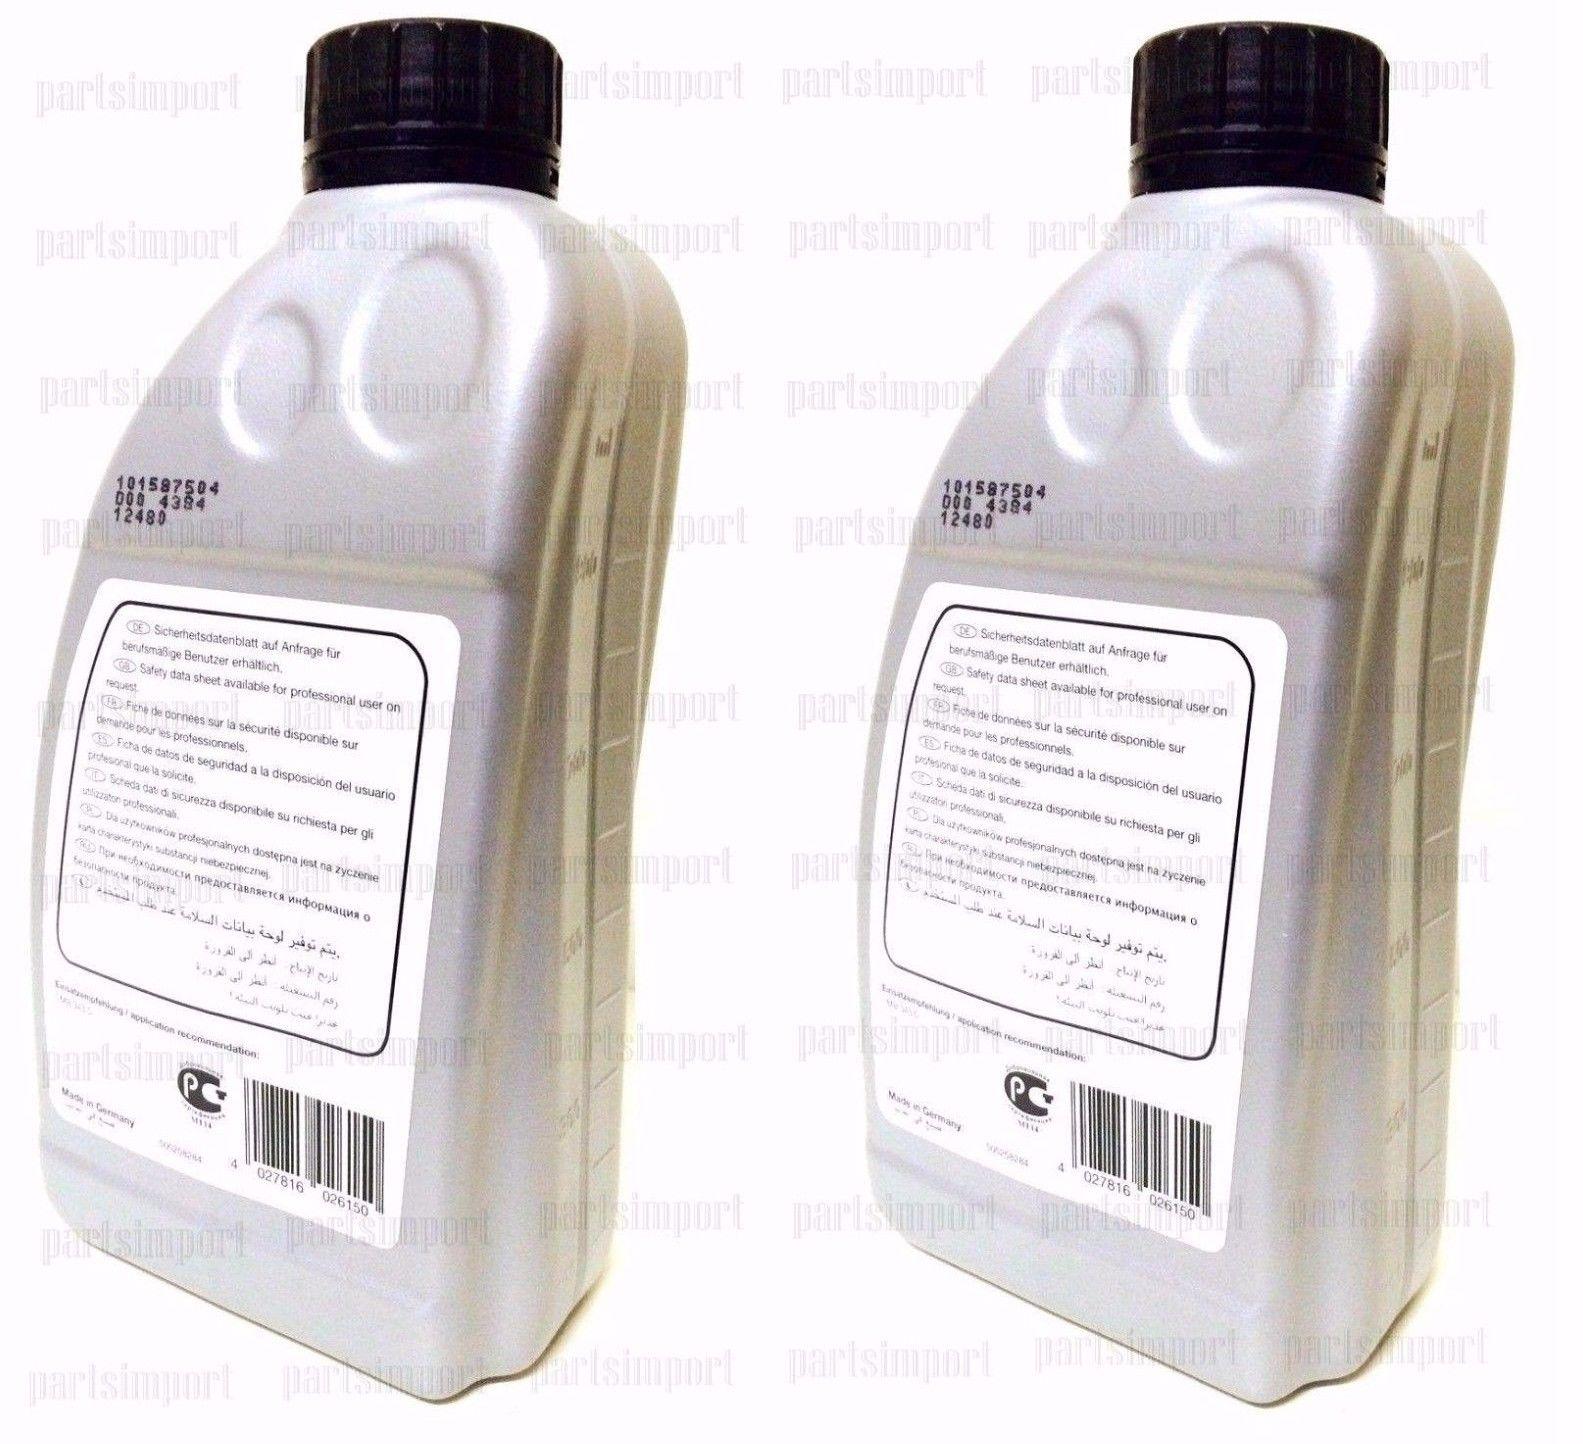 convertible top hydraulic fluid